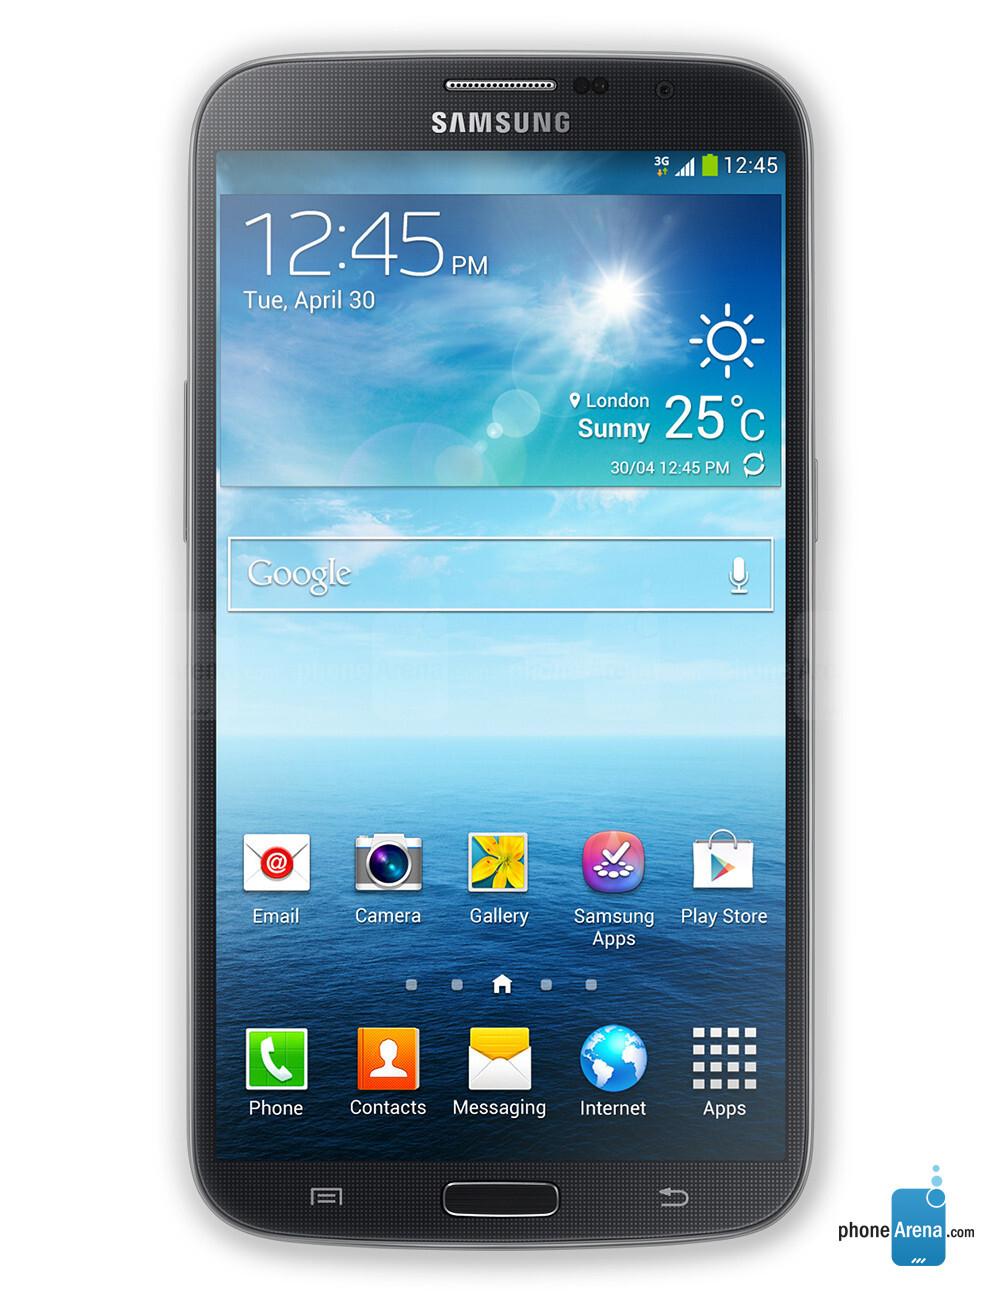 http://i-cdn.phonearena.com/images/phones/42453-xlarge/Samsung-Galaxy-Mega-6.3-0.jpg